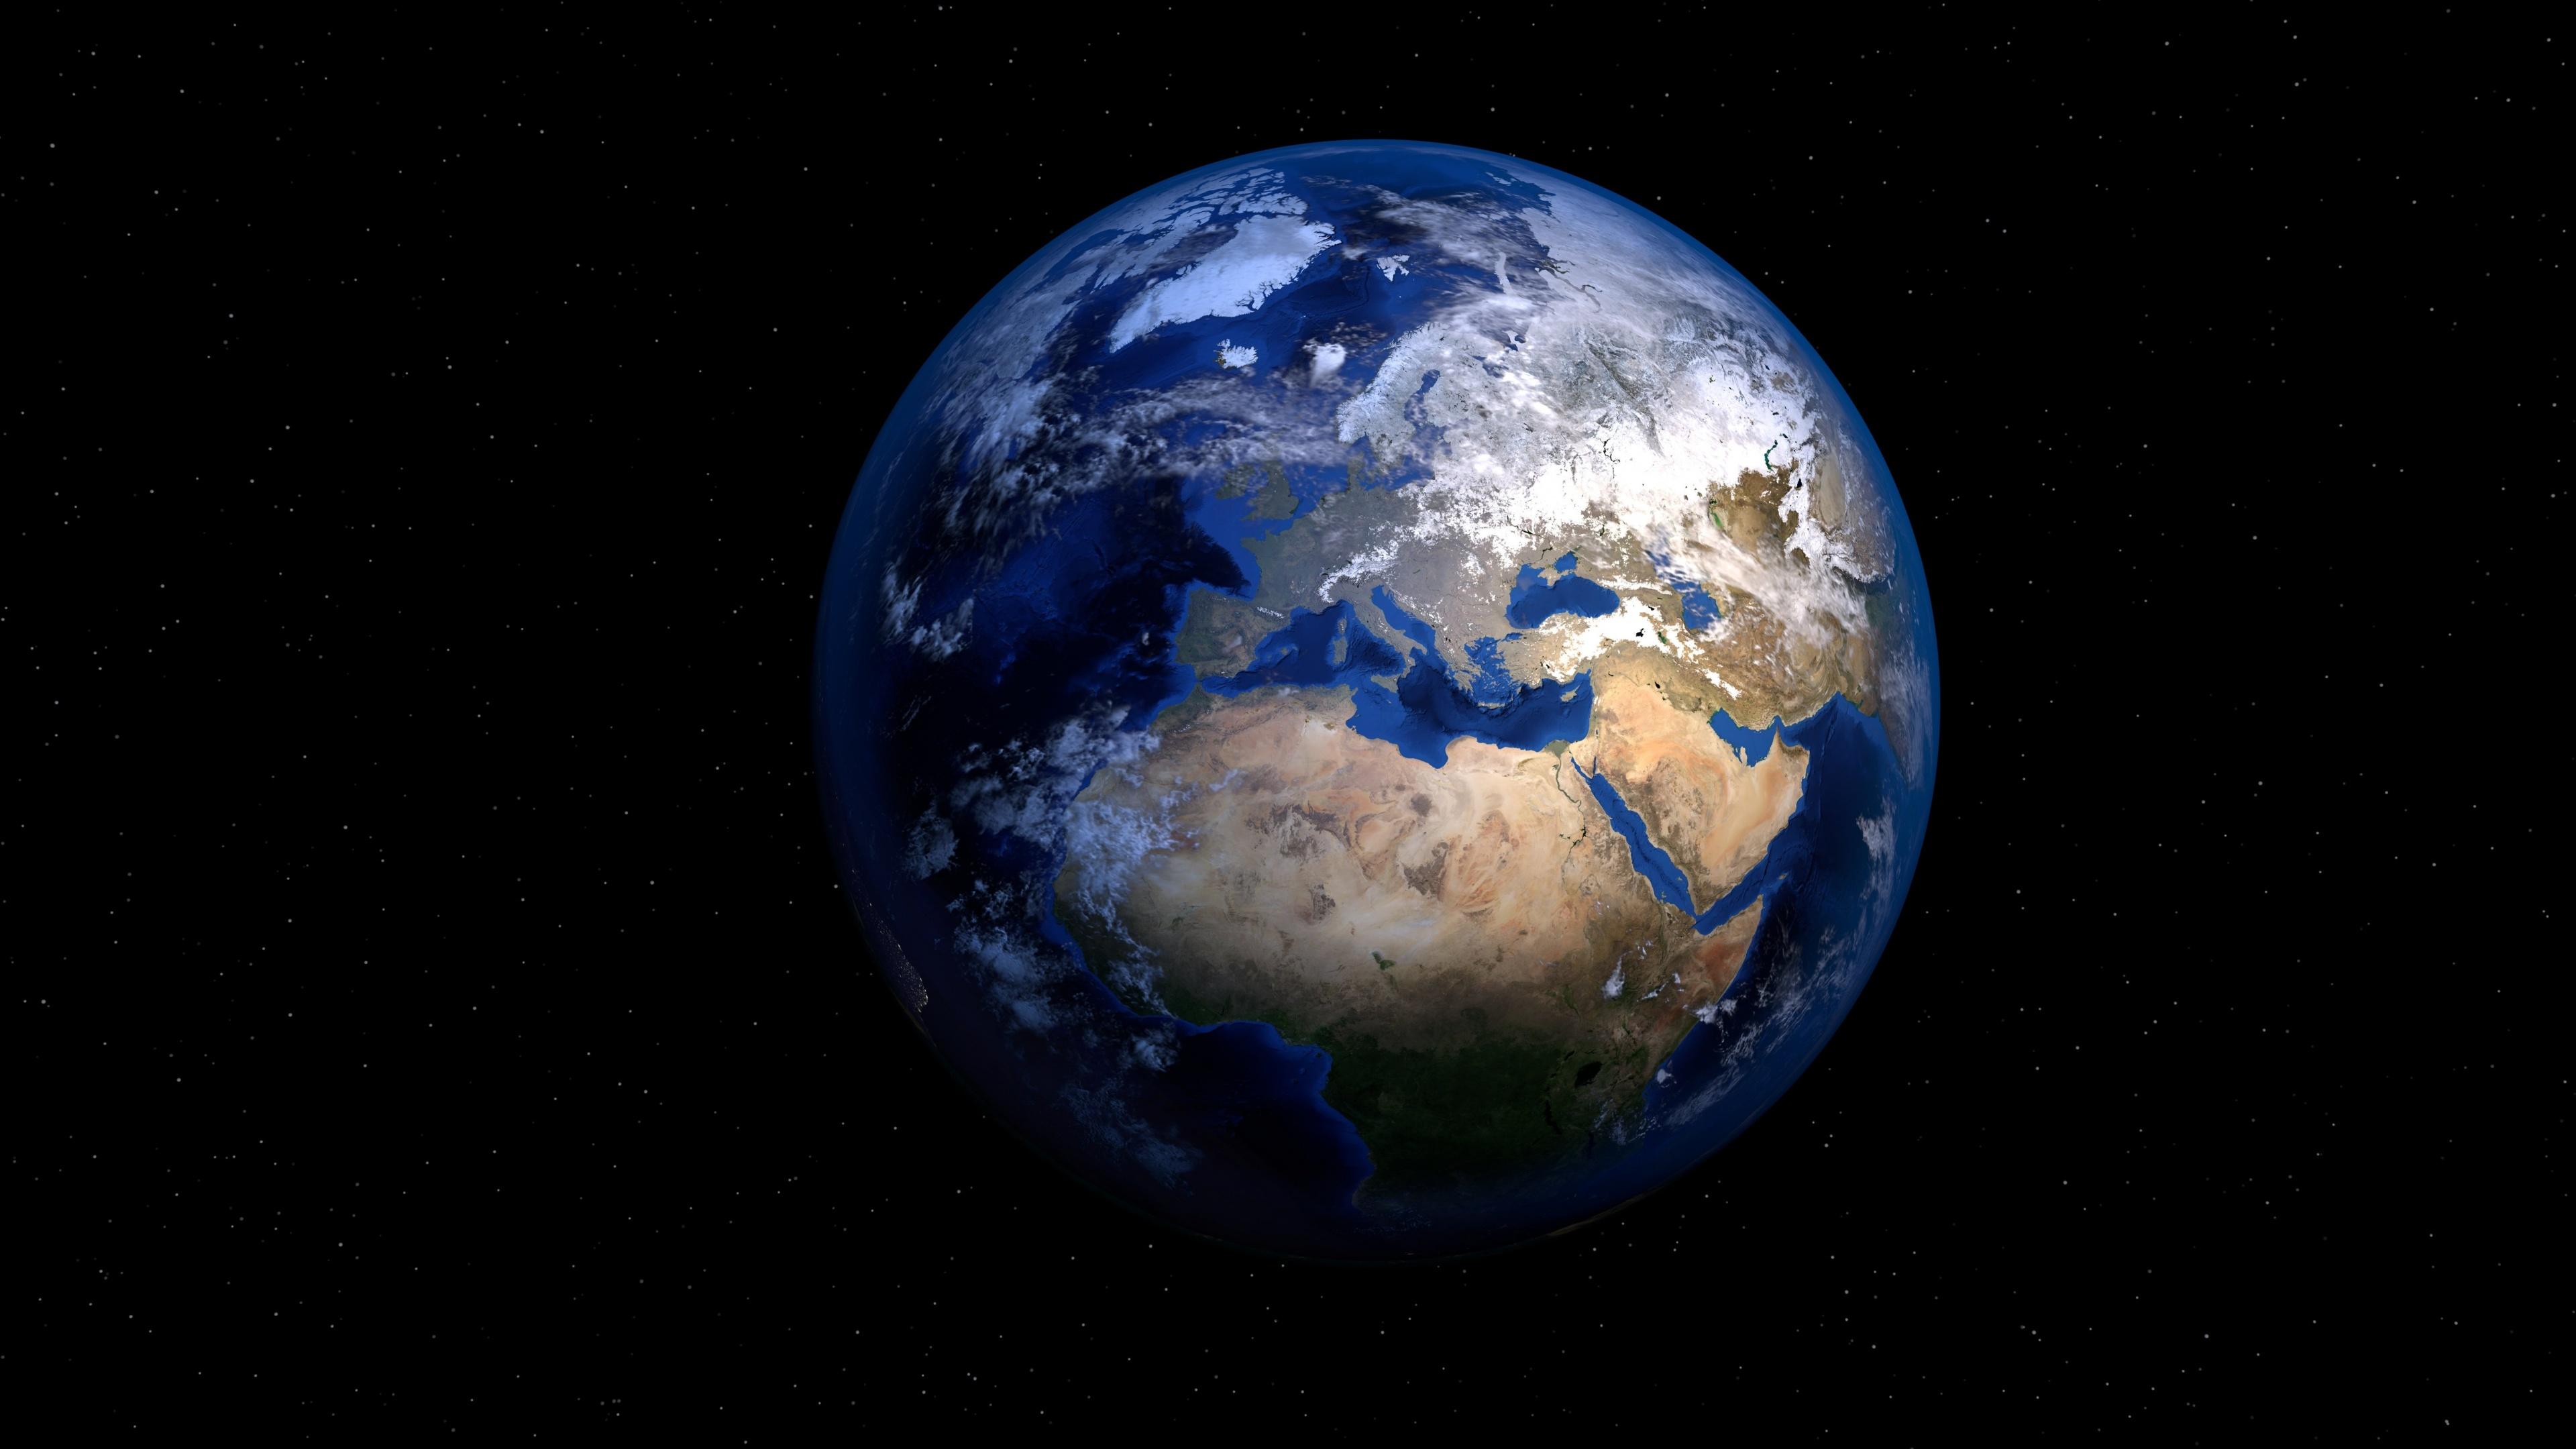 Earth 4k Wallpaper Planet Black Background Stars 5k Space 2041